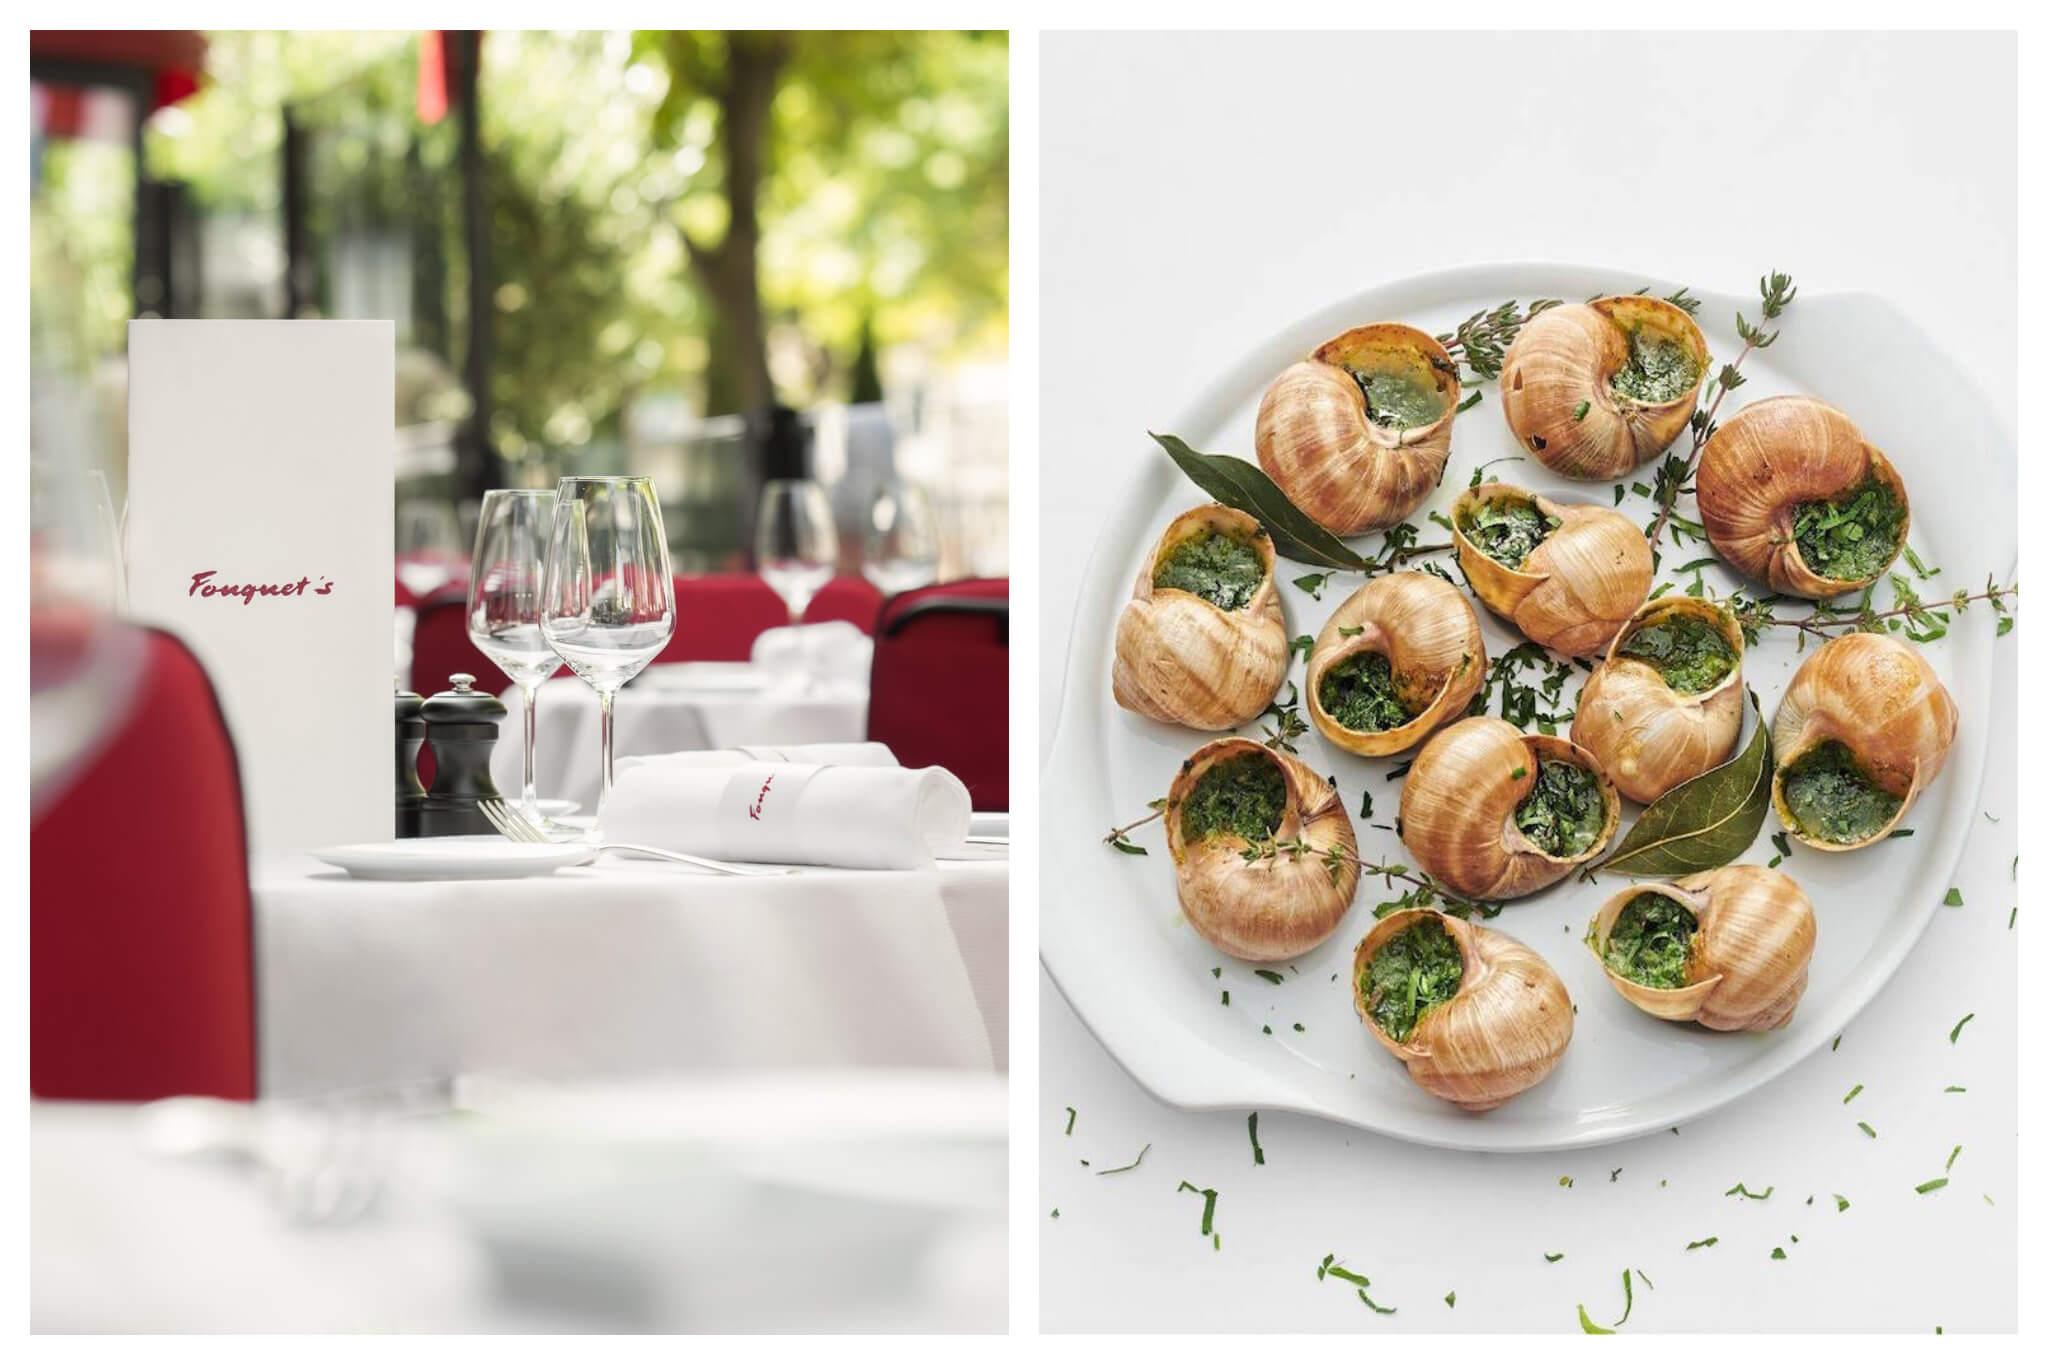 Left: Outdoors seating at Fouquet's restaurant, right: A plate of escargot at Fouquet's restaurant near the Champs Elysées